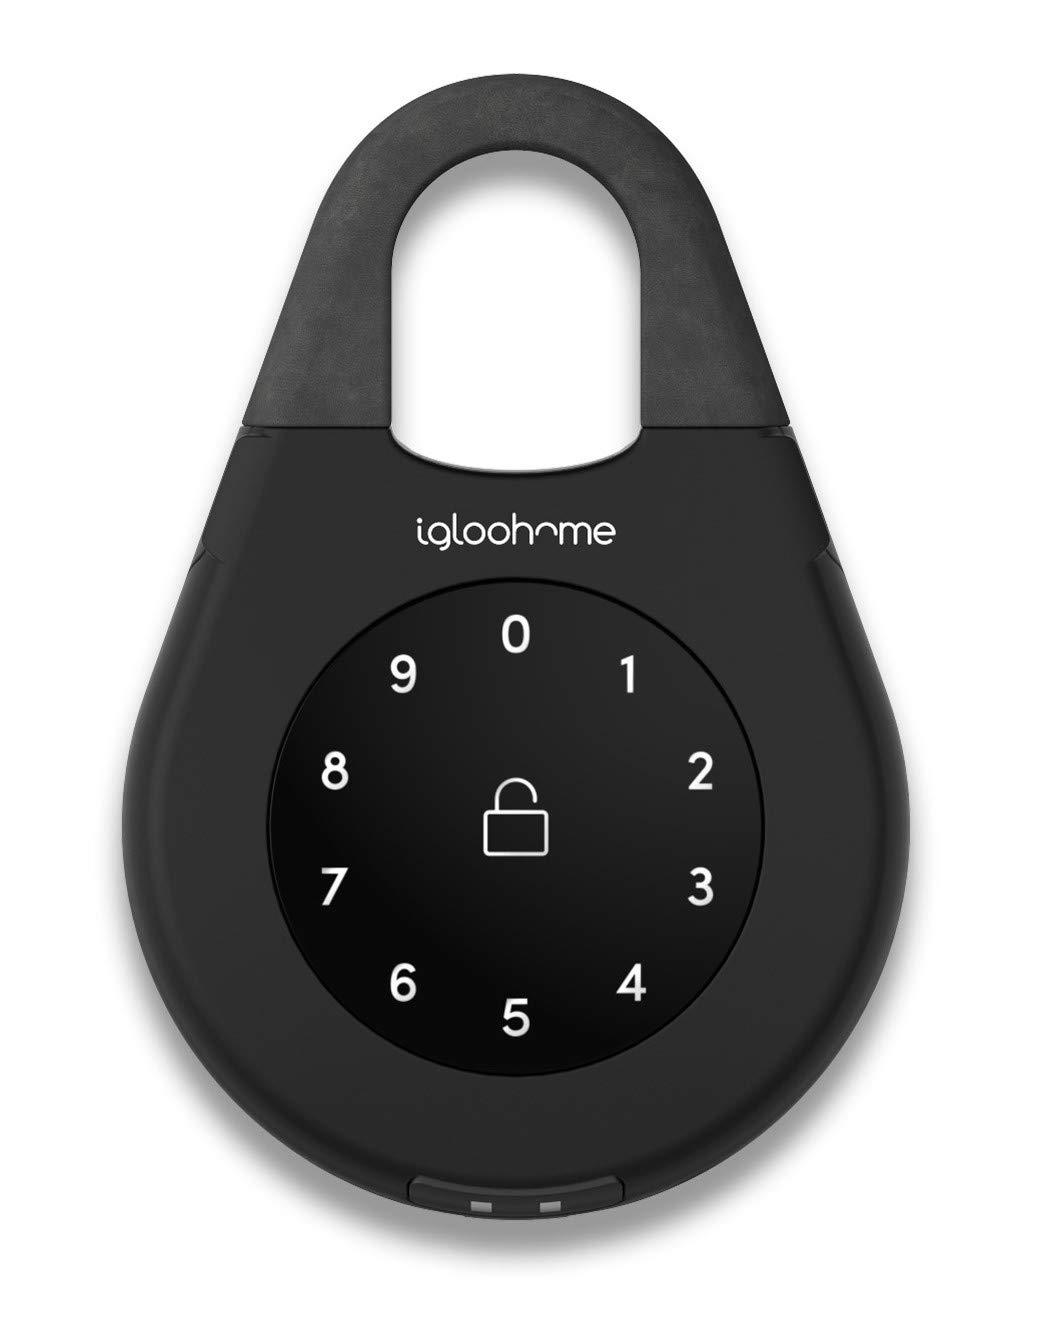 Igloohome Smart Keybox 2 - Storage Lockbox for Keys - Grant & Control Access Remotely - Works Offline by igloohome